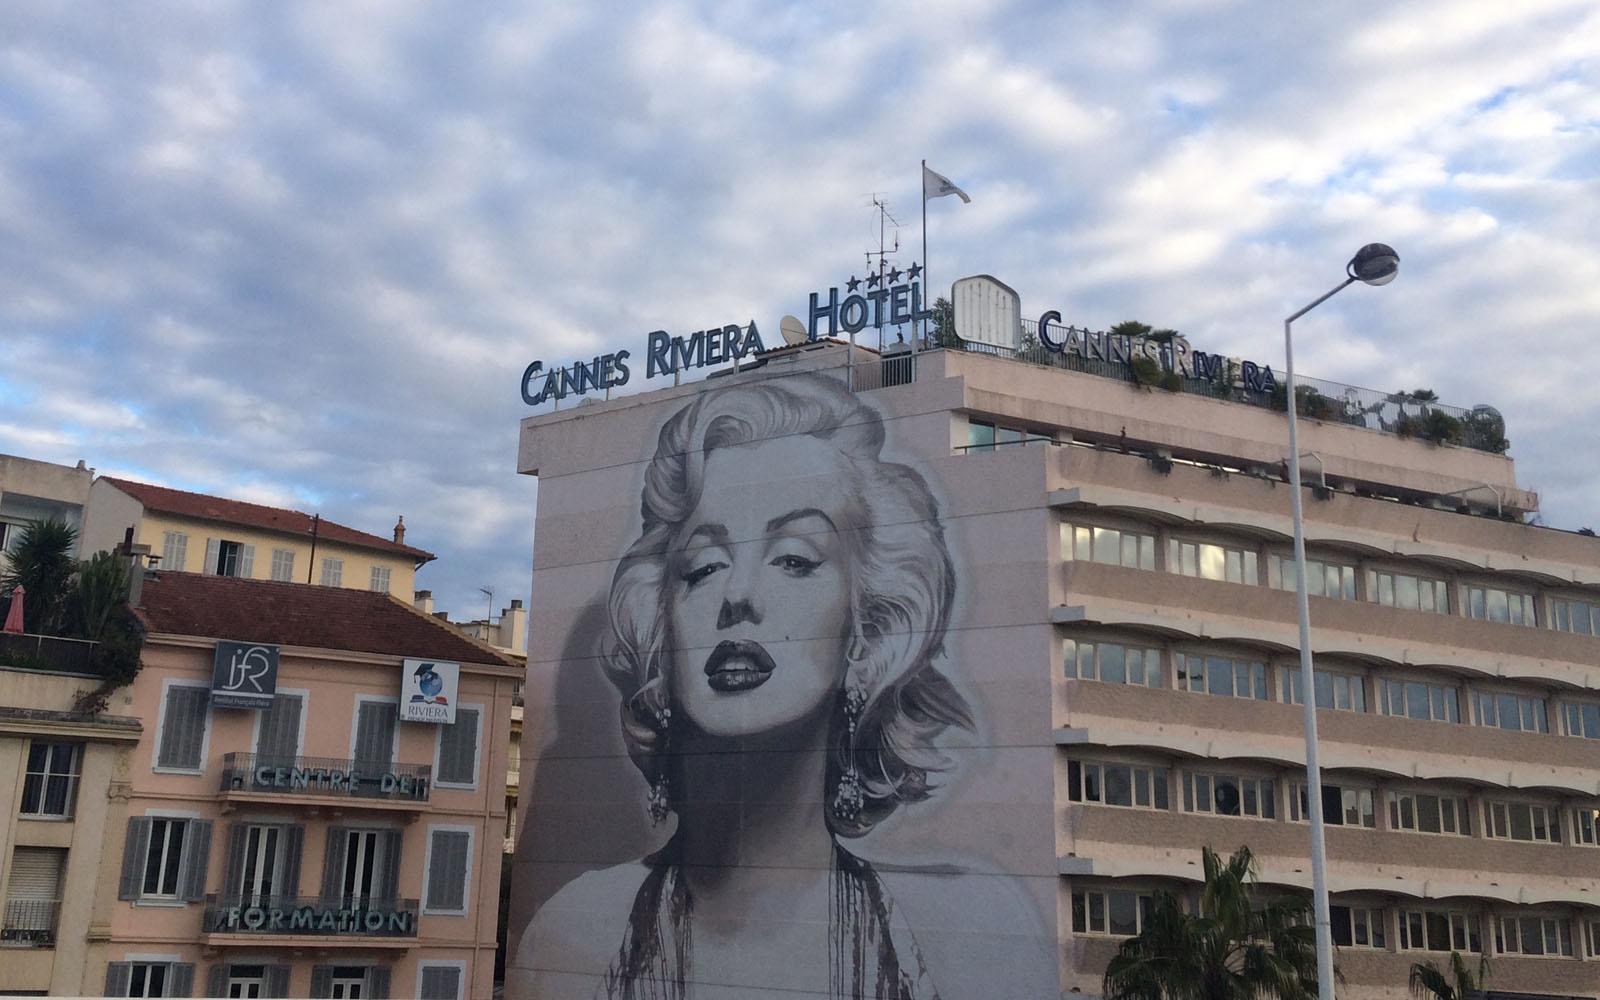 Il muro dedicato a Marilyn Monroe, in boulevard d'Alsace 16.